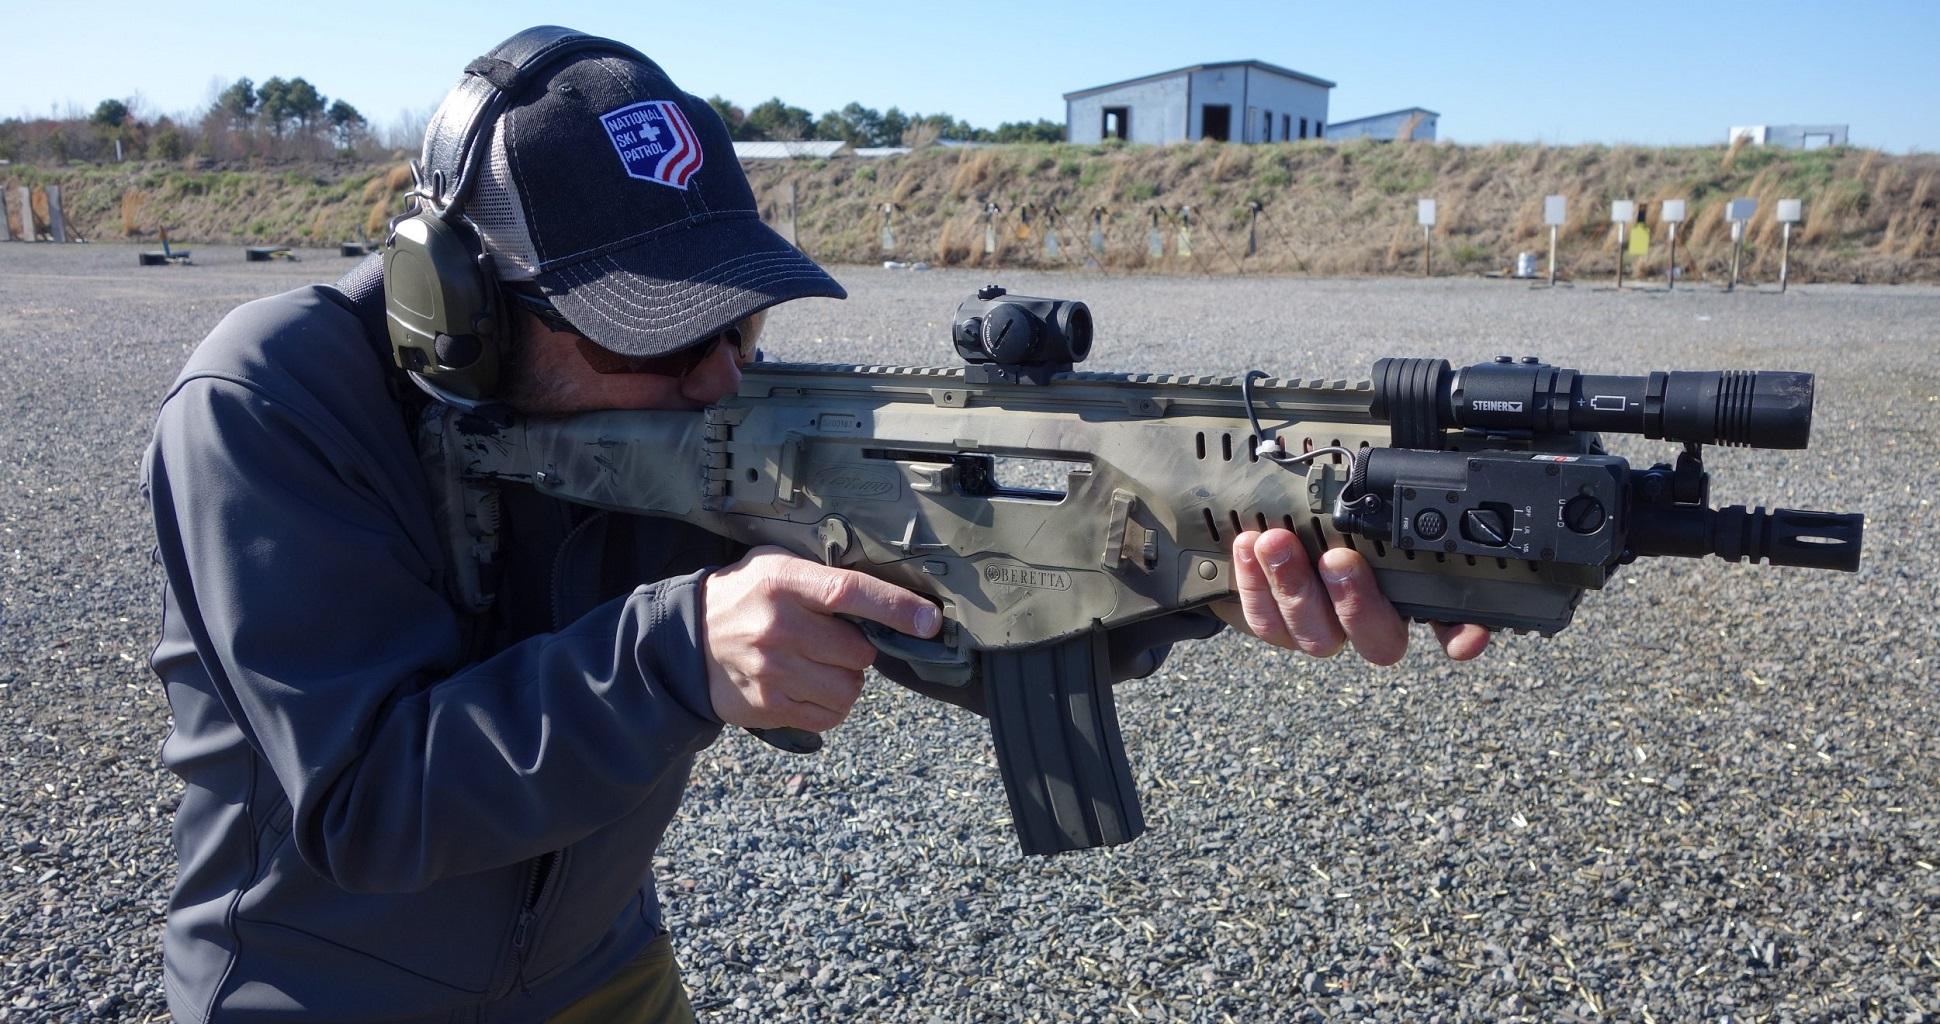 Short Barrel Rifle - Why Use It